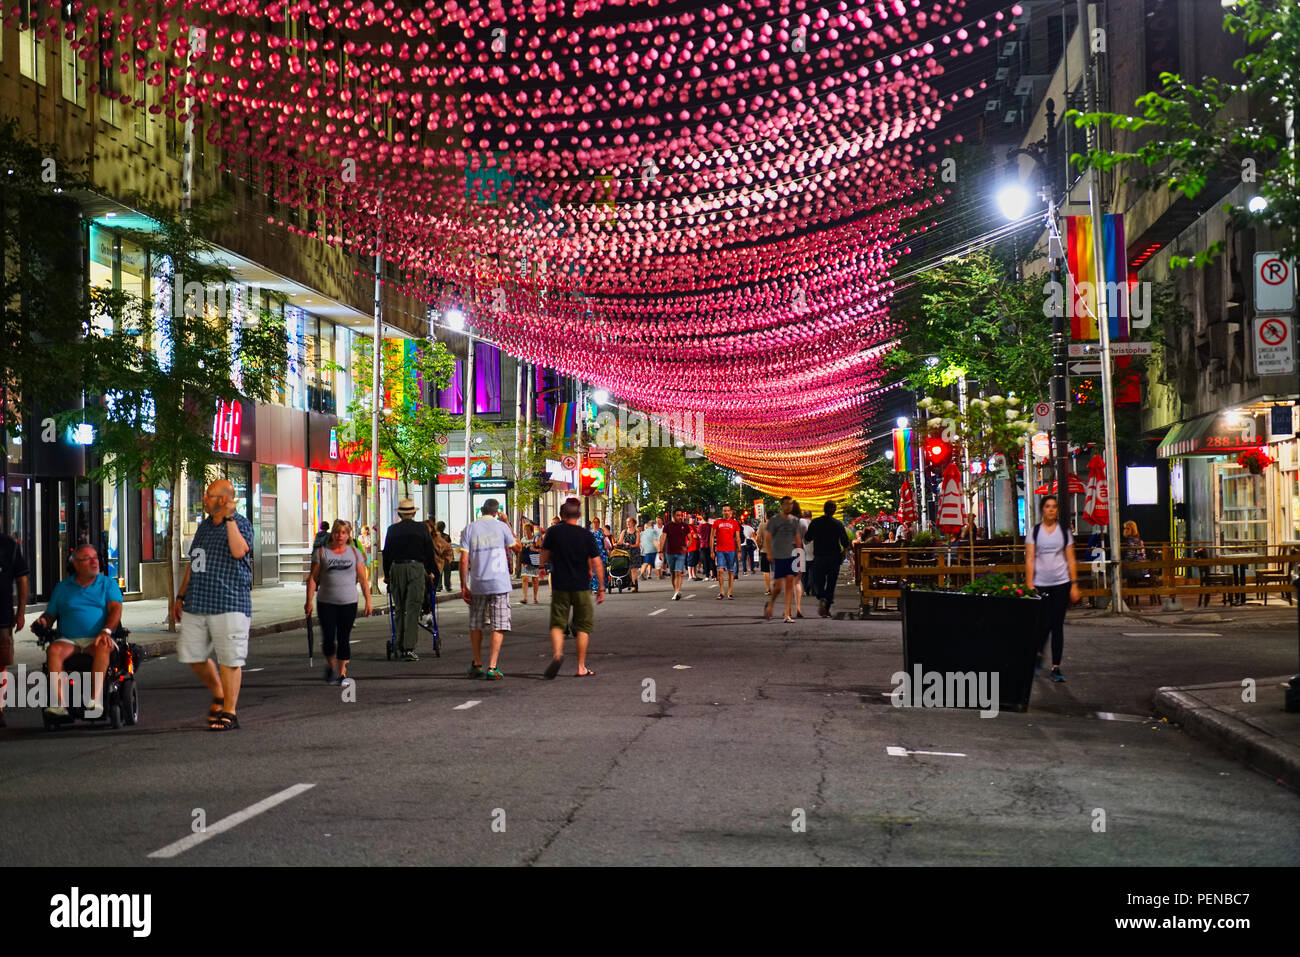 Montreal,Canada,15 August 2018.People walking along  Montreal's gay village.Credit:Mario Beauregard/Alamy Live News - Stock Image